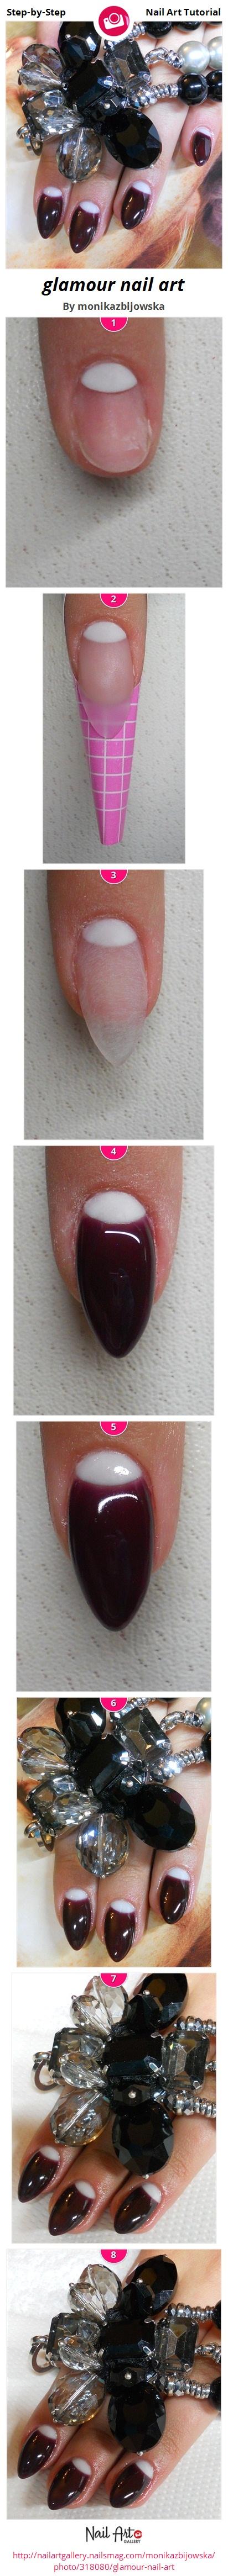 glamour nail art by monikazbijowska - Nail Art Gallery Step-by-Step ...